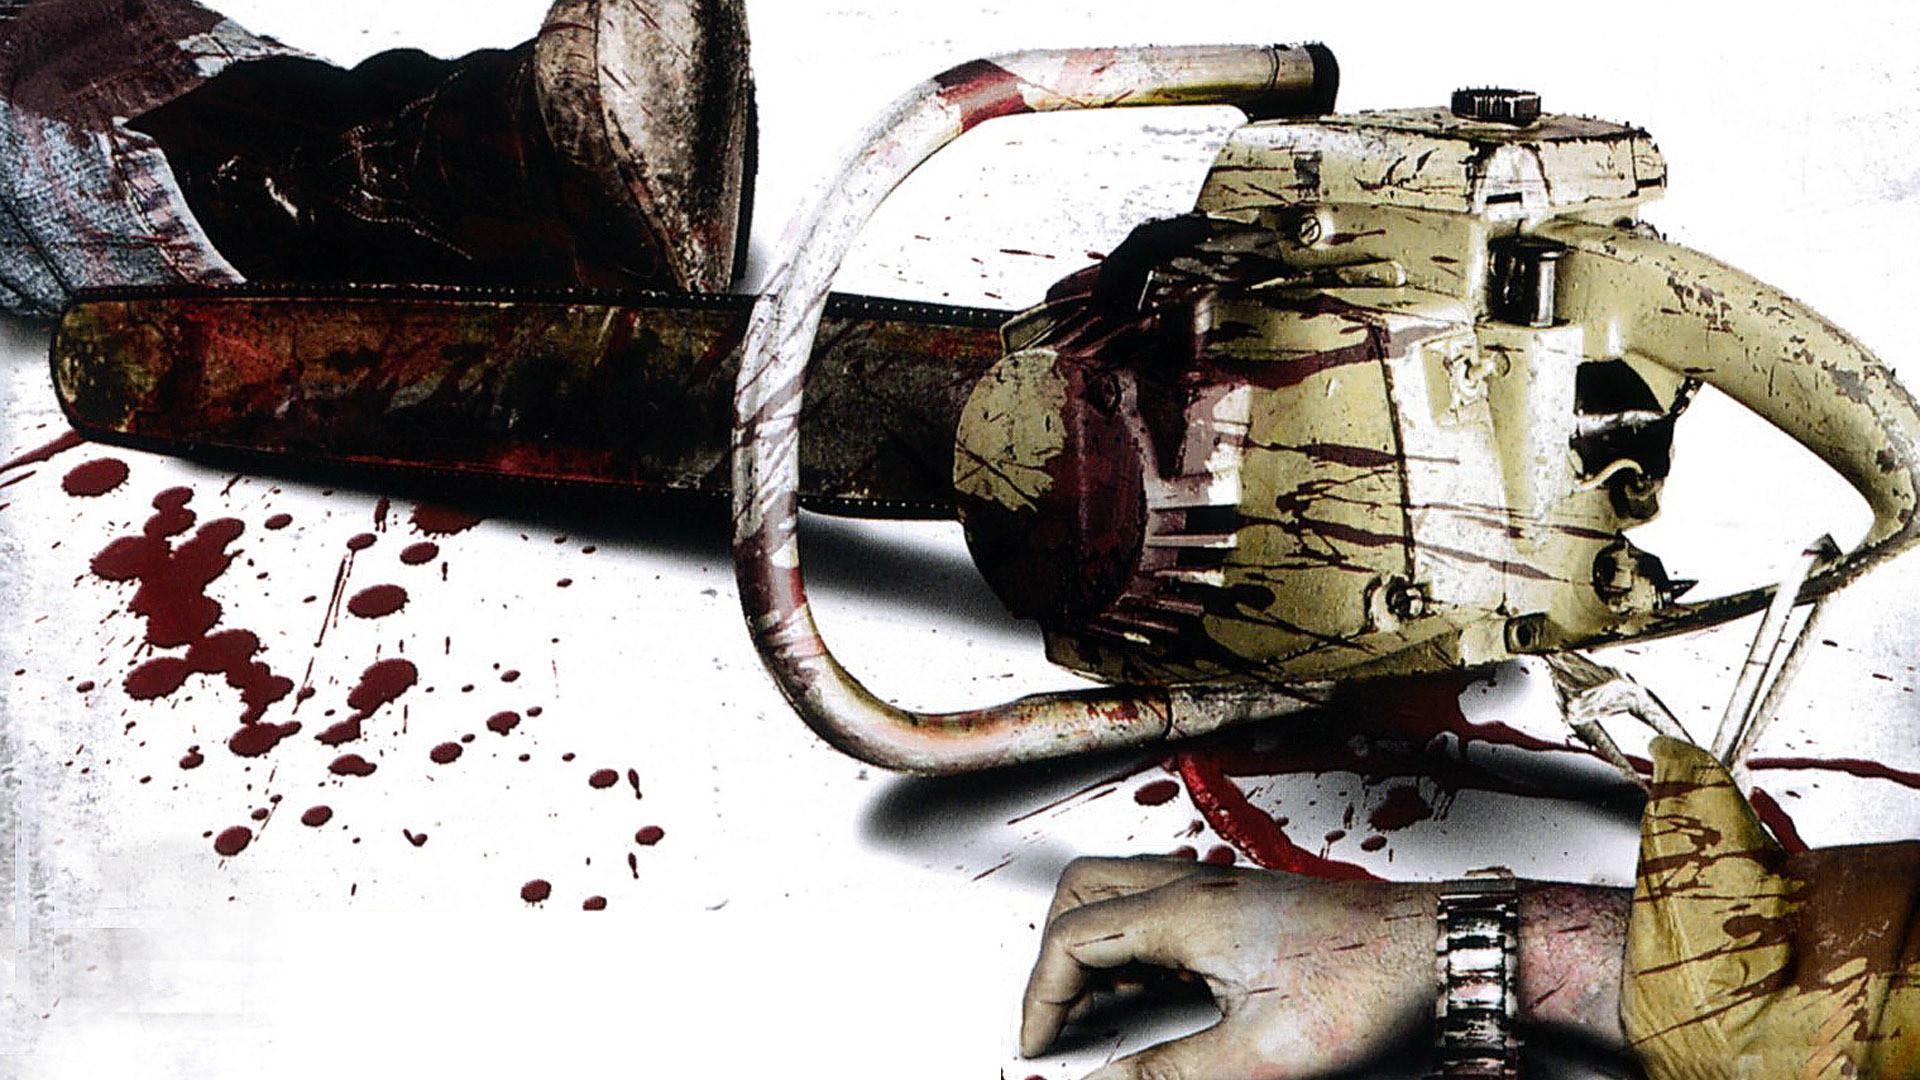 Whorehouse Massacre, The - The Whorehouse Massacre